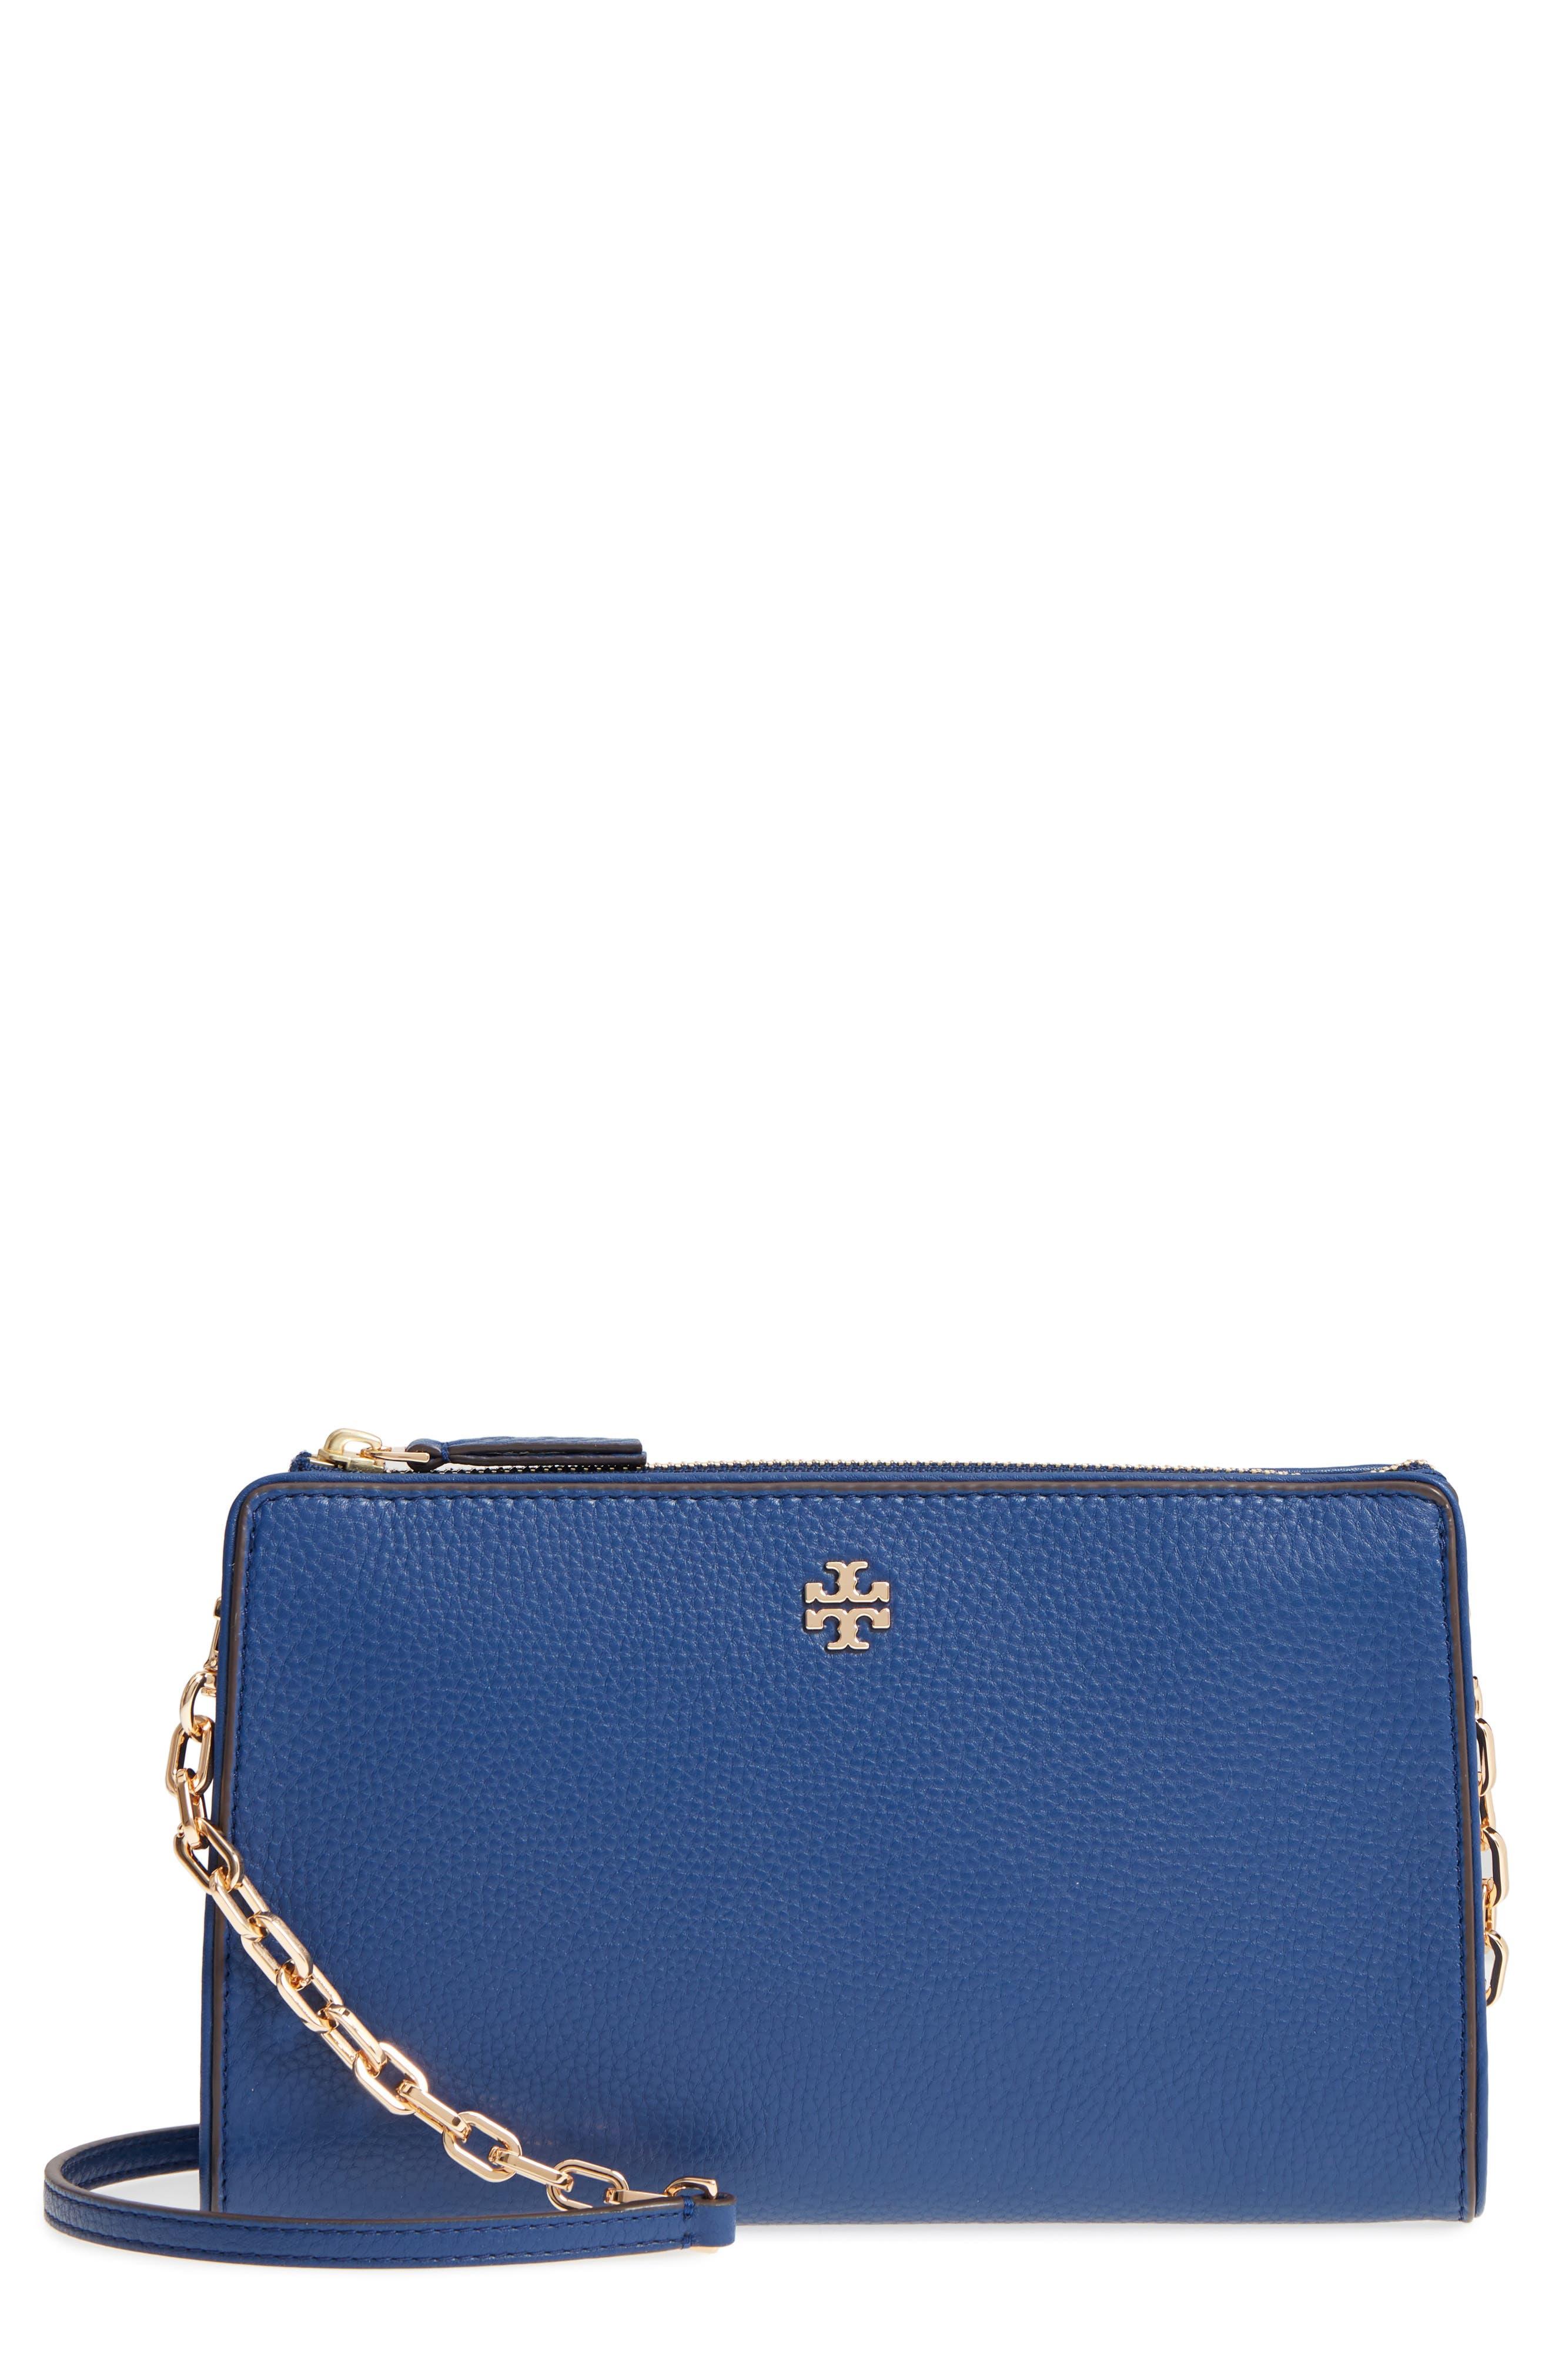 Marsden Leather Wallet Crossbody Bag,                         Main,                         color, FRESH BLUEBERRY